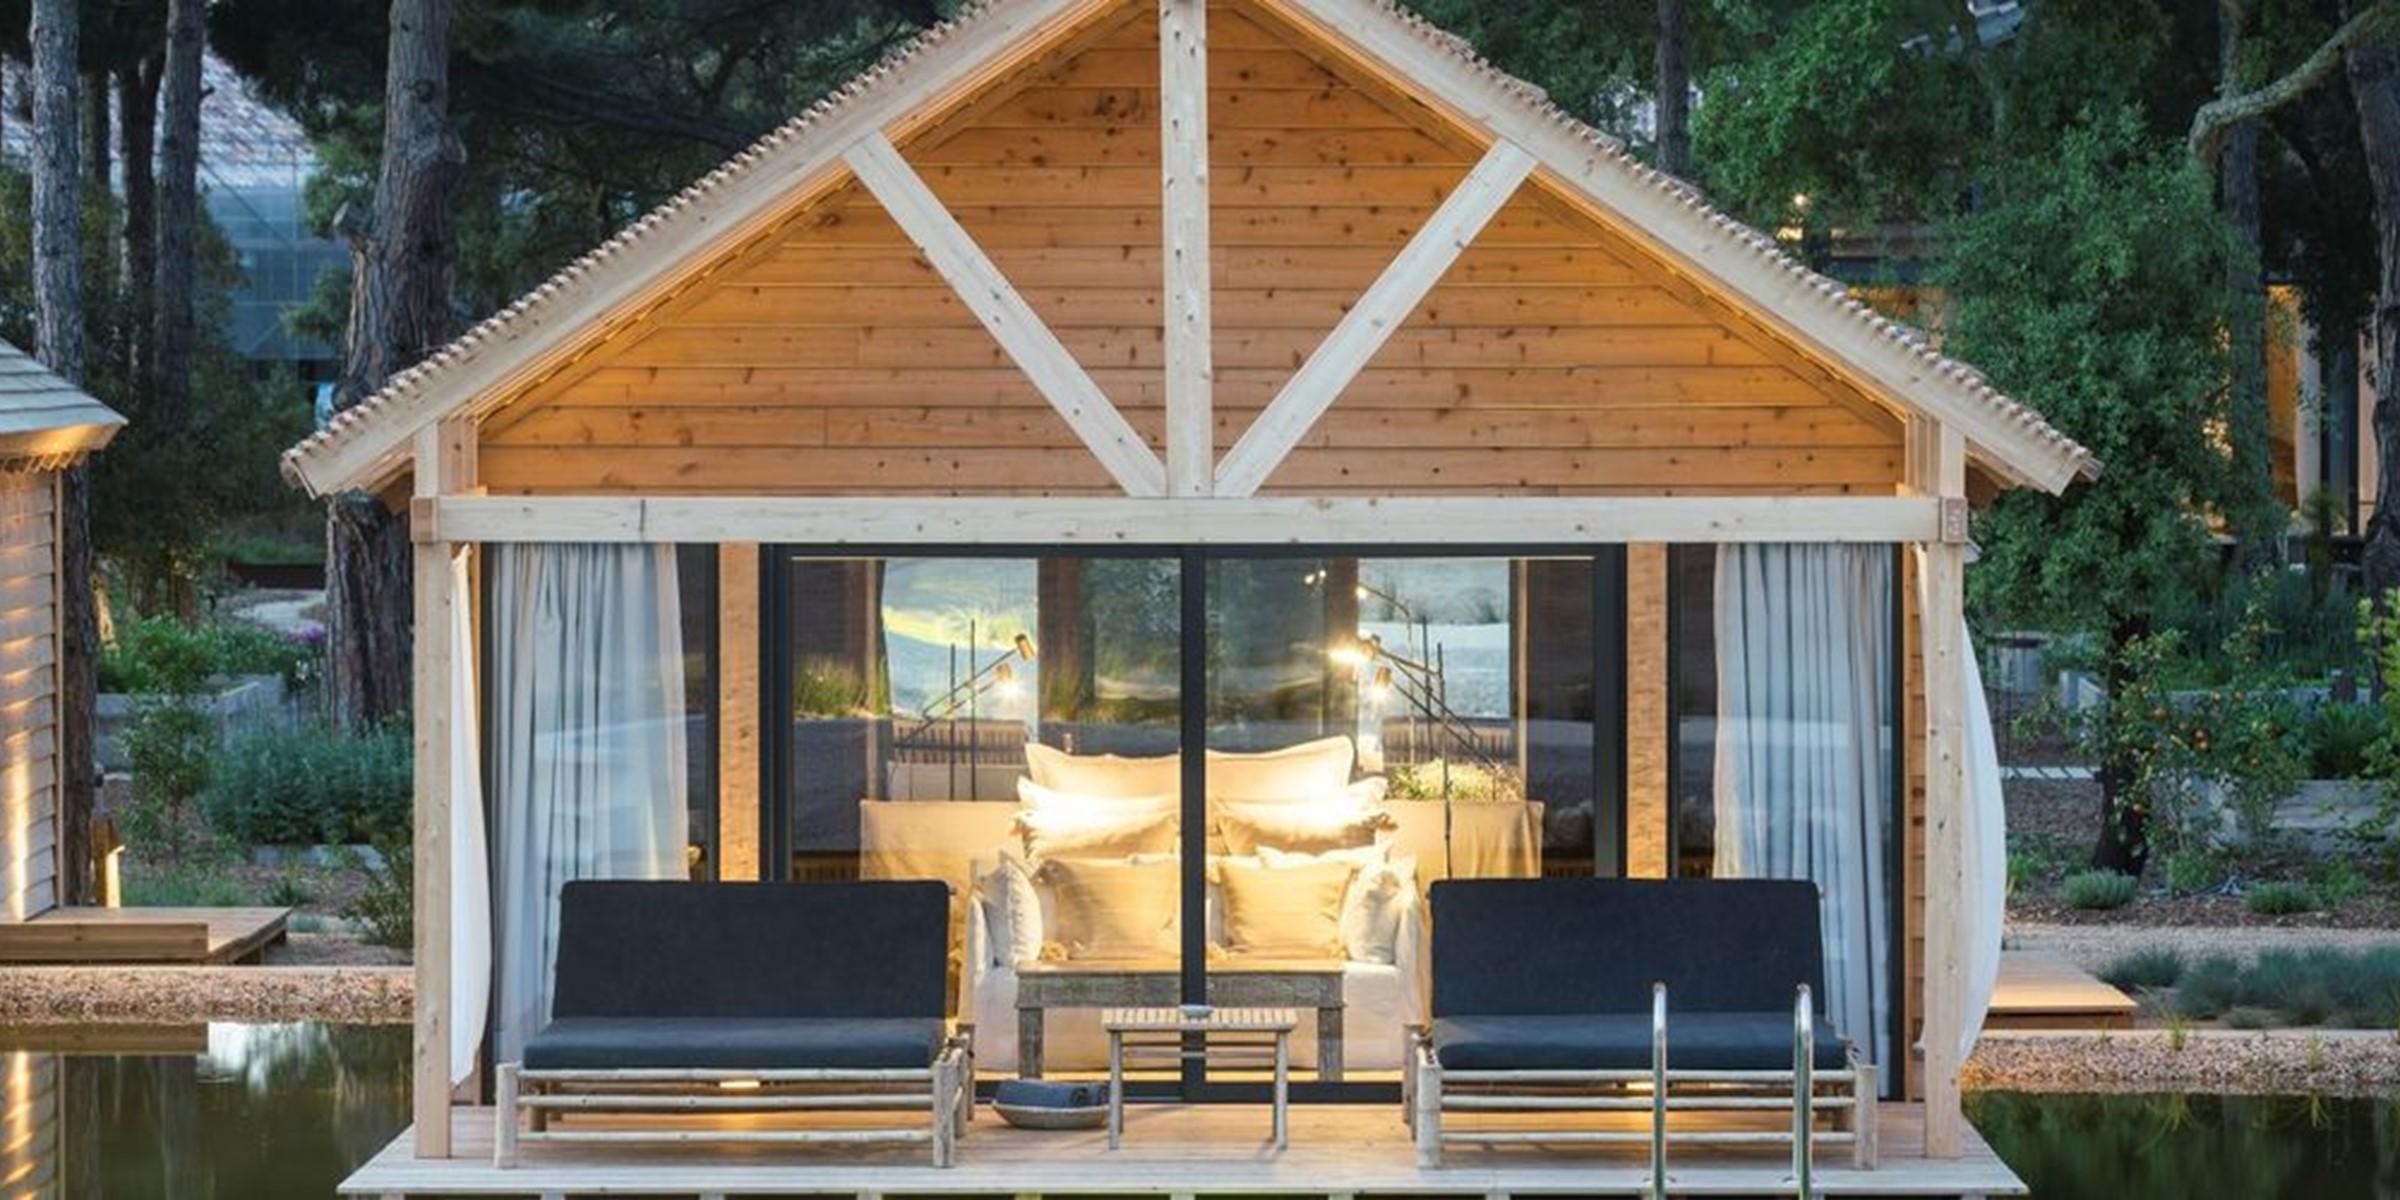 Sublime Comporta Country Retreat Amp Spa Room Sublime Comporta Bio Pool Suites 100519 0974 Vf